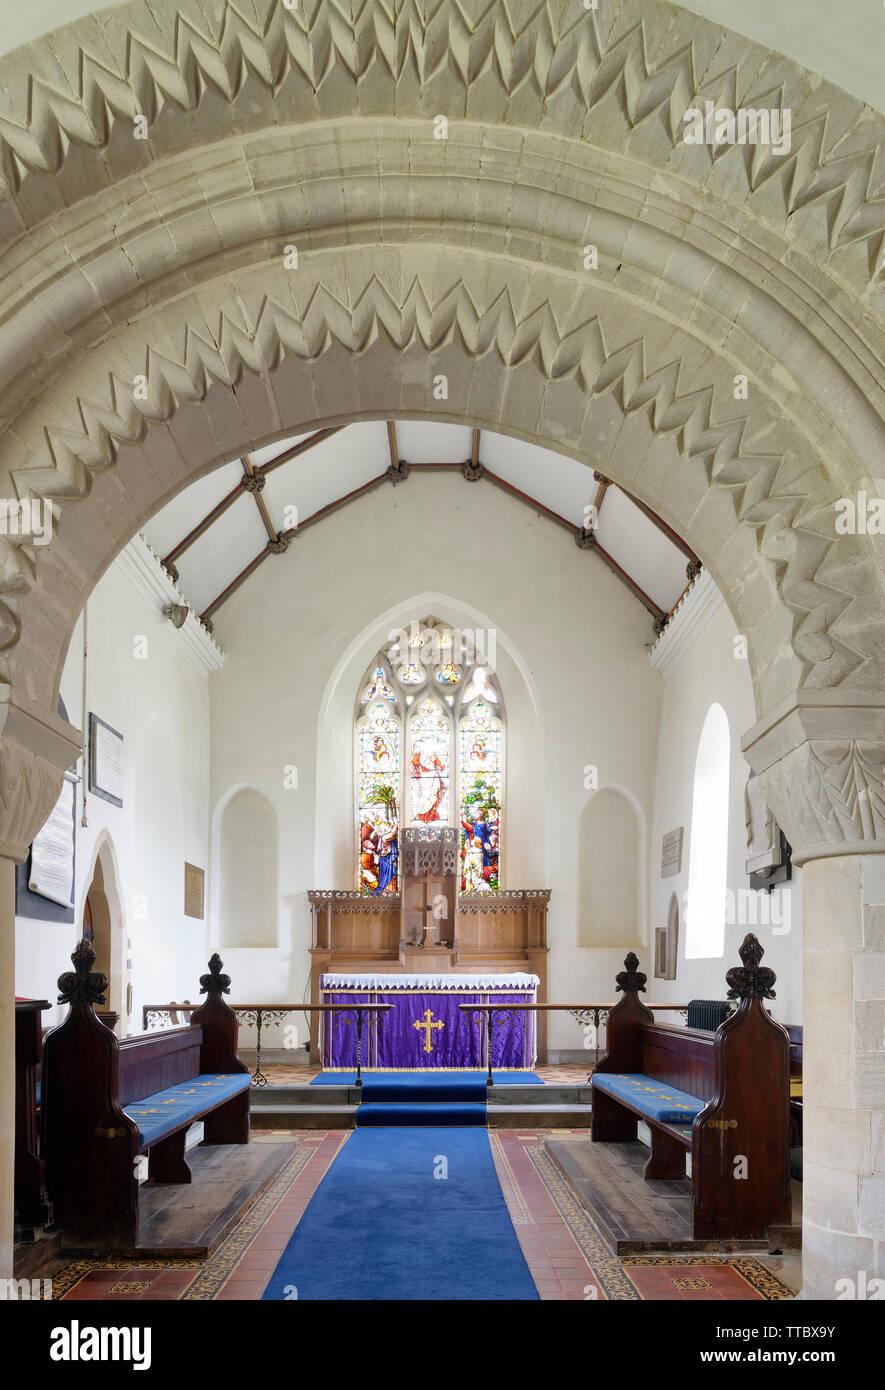 St Mary Magdelene Church, Tormarton, South Gloucestershire, UK  Grade I listed Norman Church - Stock Image